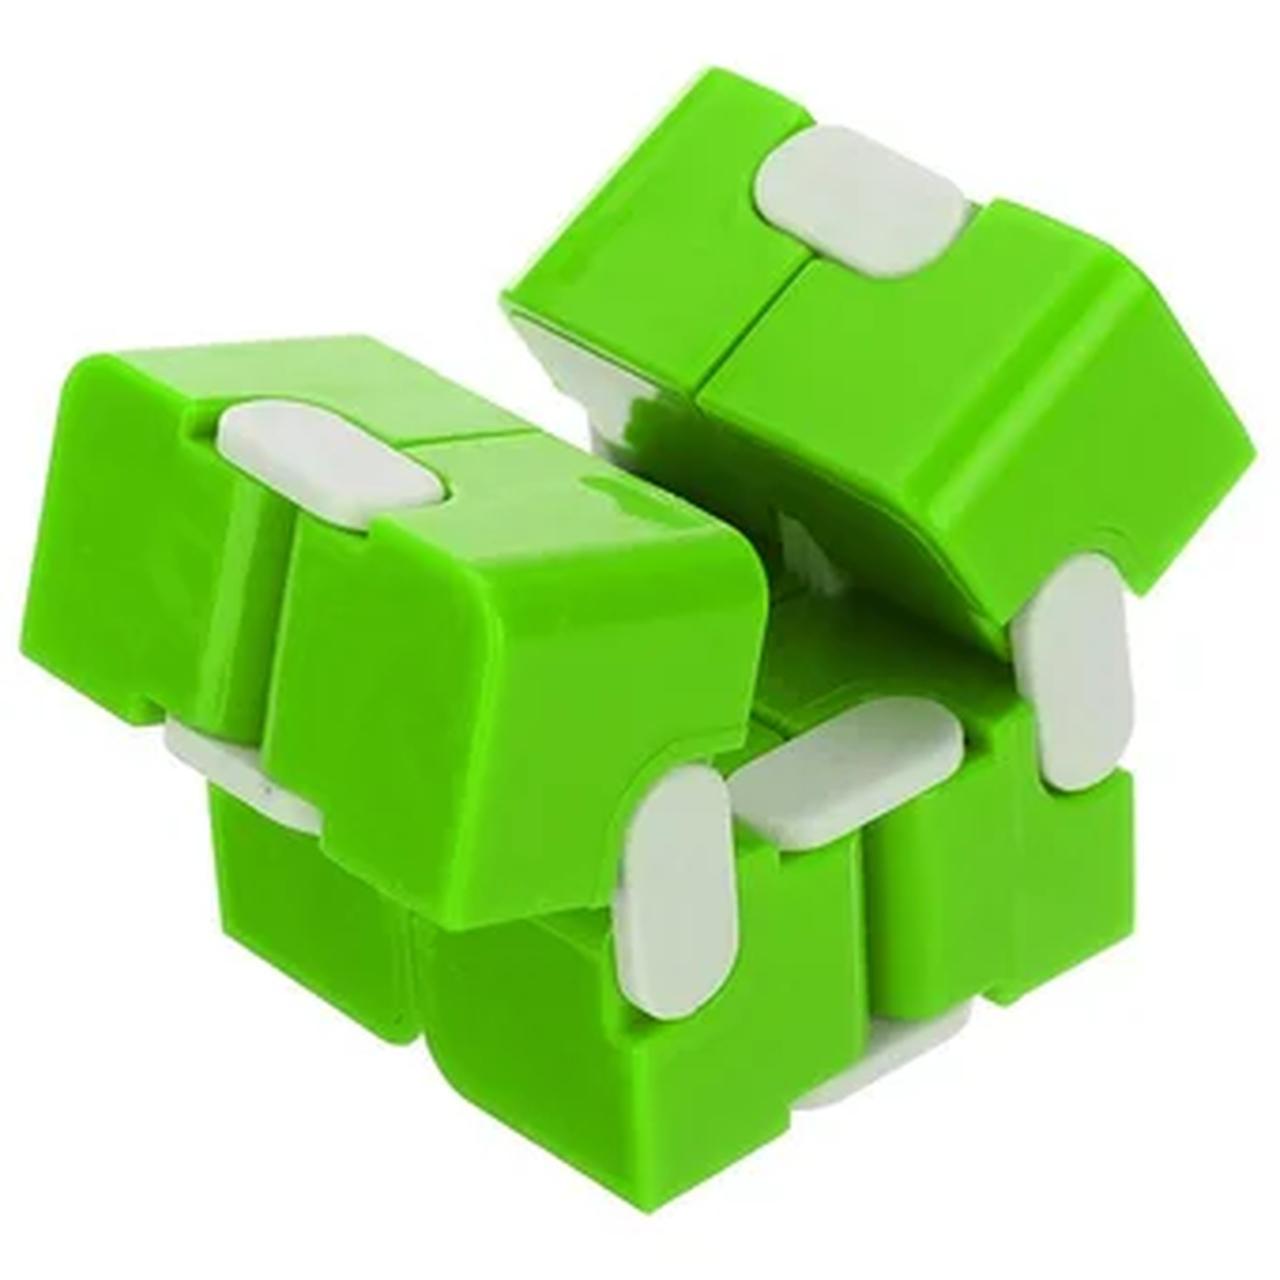 Cubo Magico Infinito Verde (My Infinity Cube)